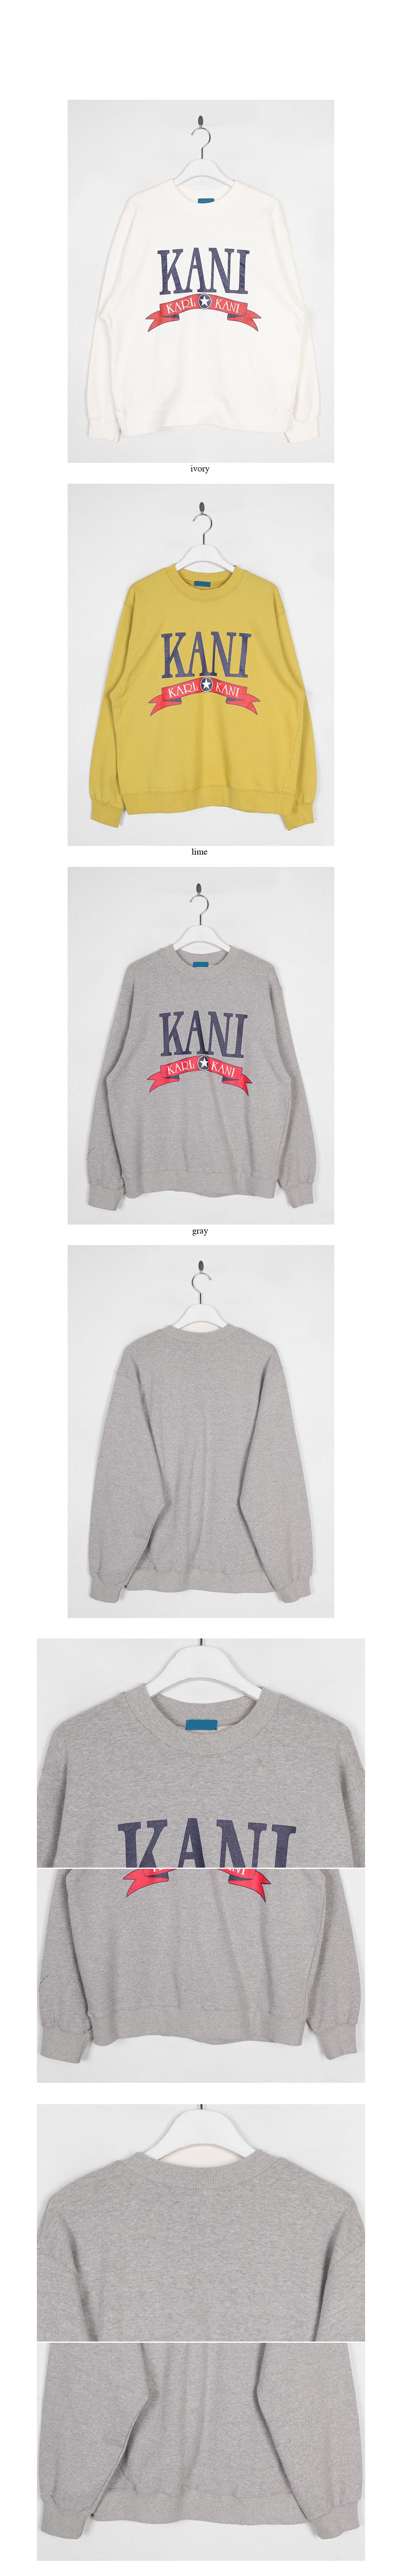 kalkani sweatshirt